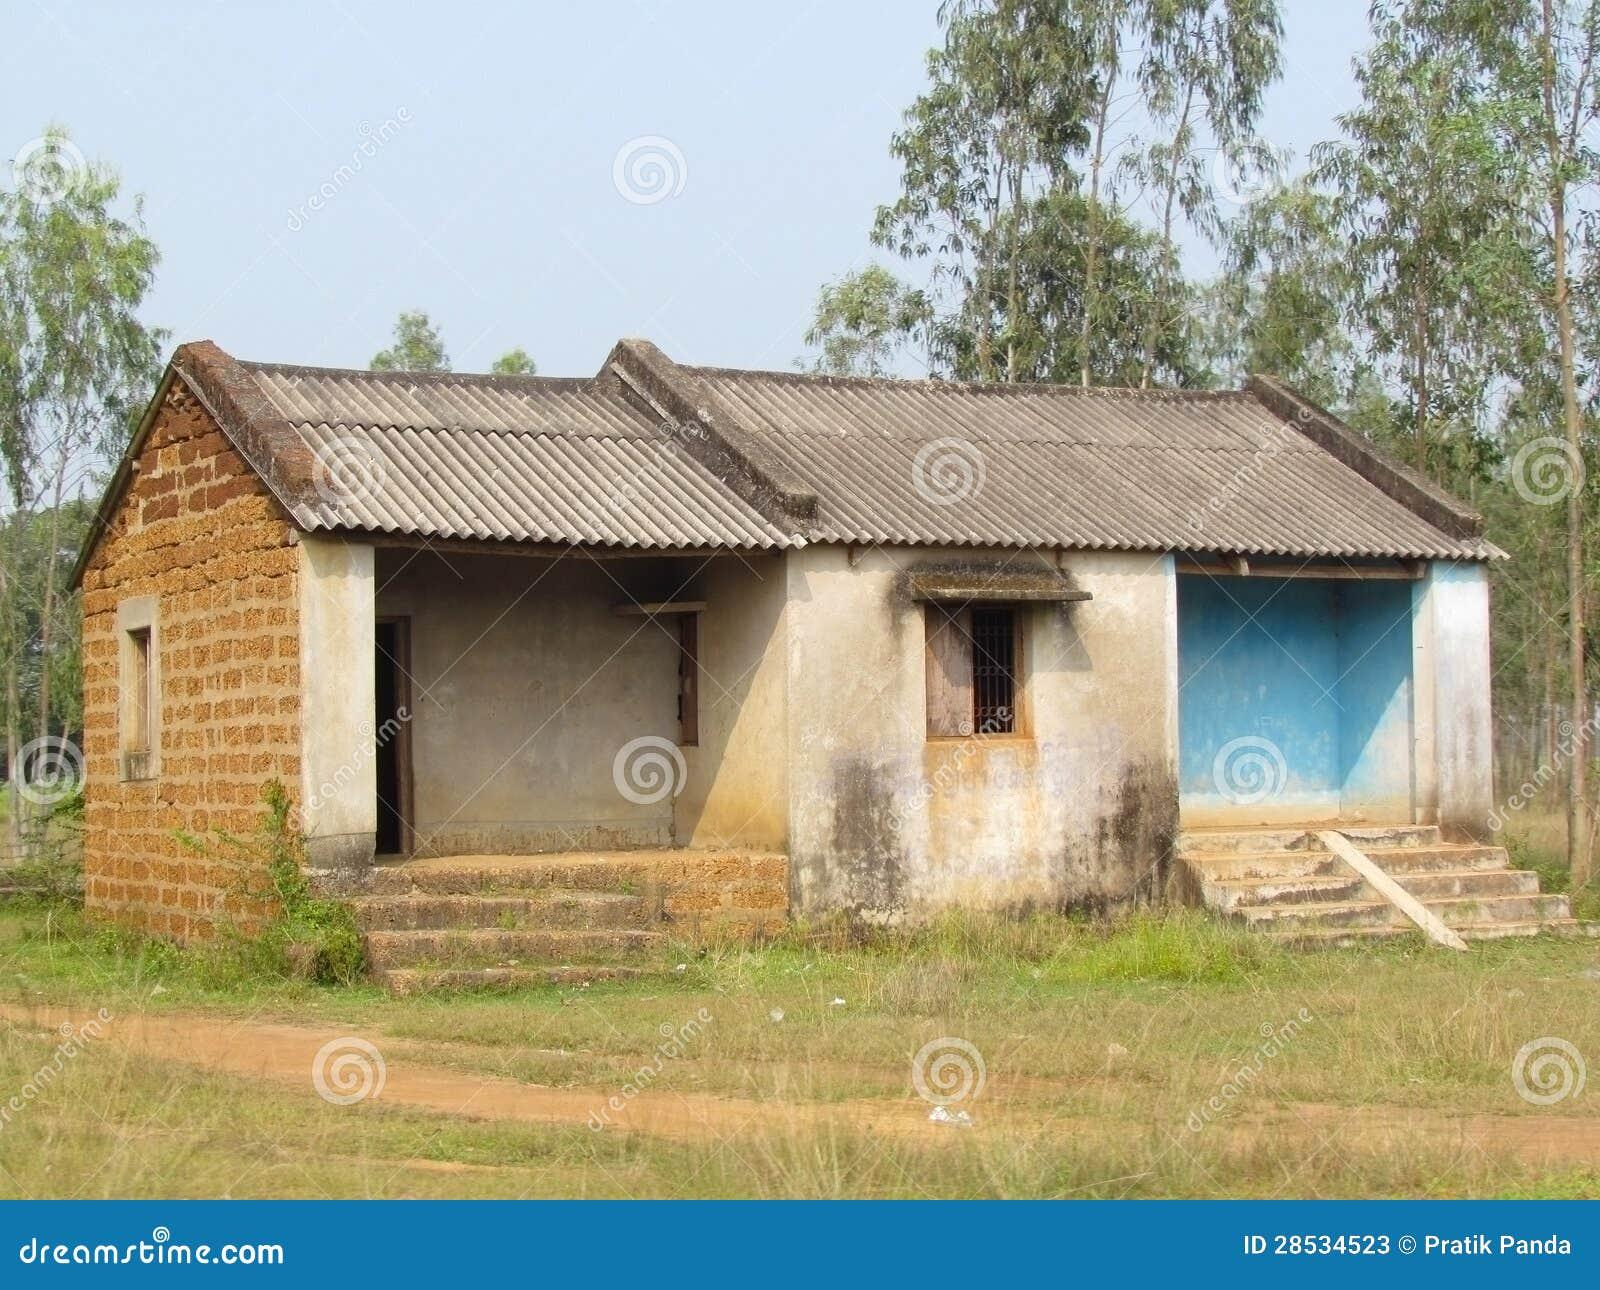 Poor indian rural brick house stock image image 28534523 - Casas rurales de madera ...